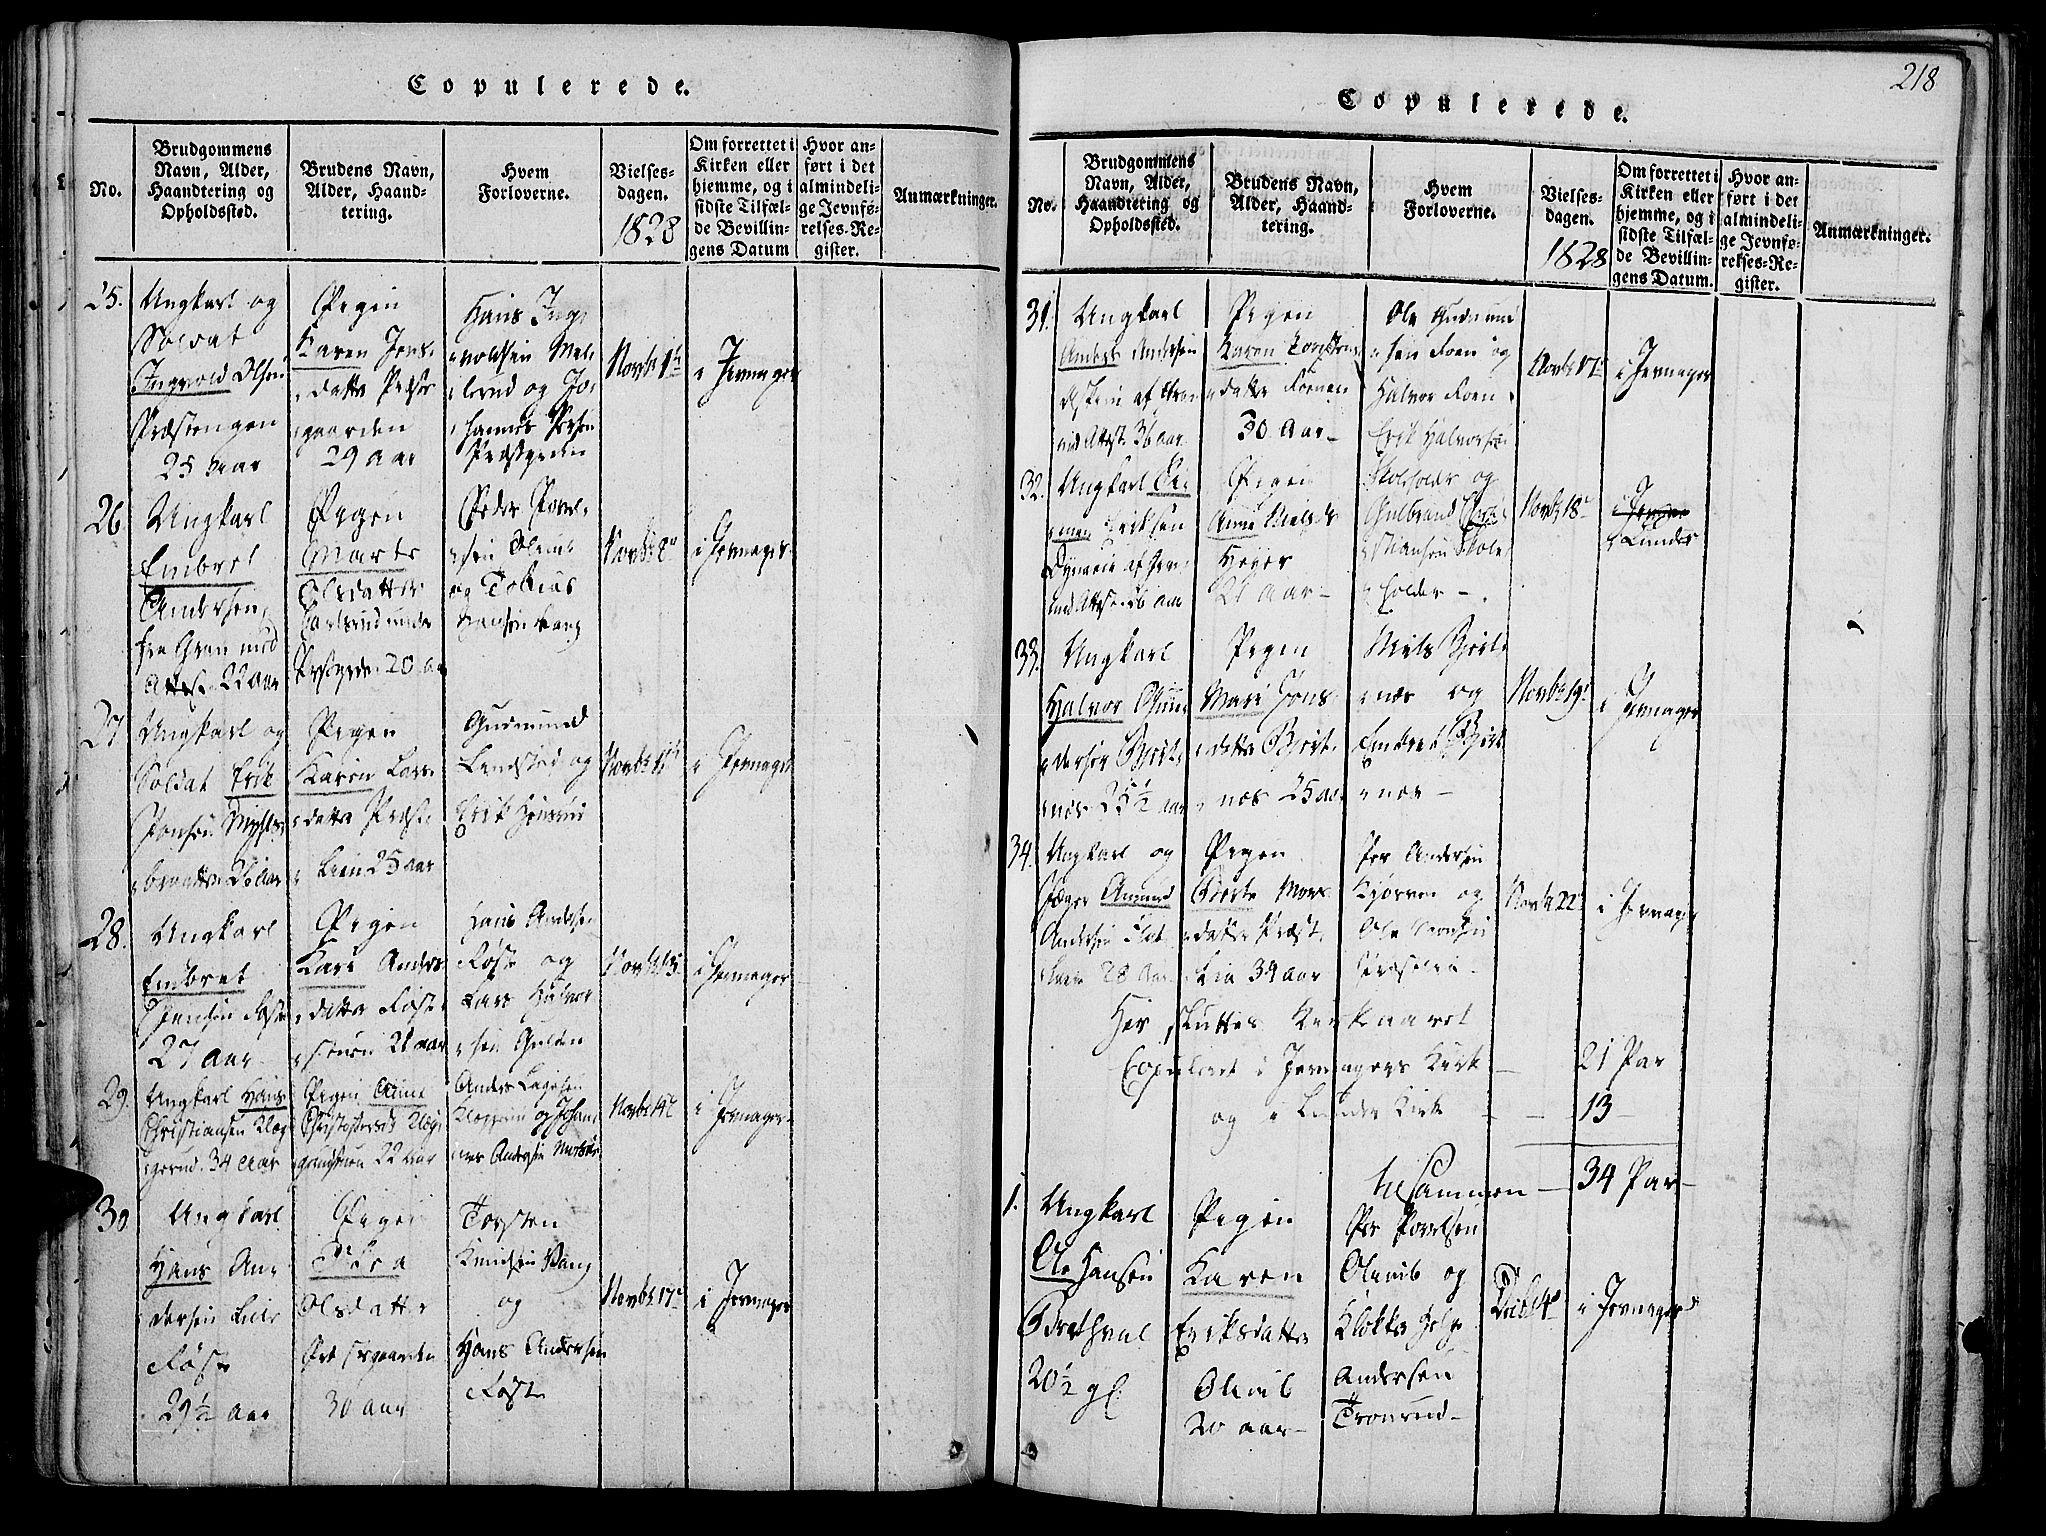 SAH, Jevnaker prestekontor, Ministerialbok nr. 5, 1815-1837, s. 218